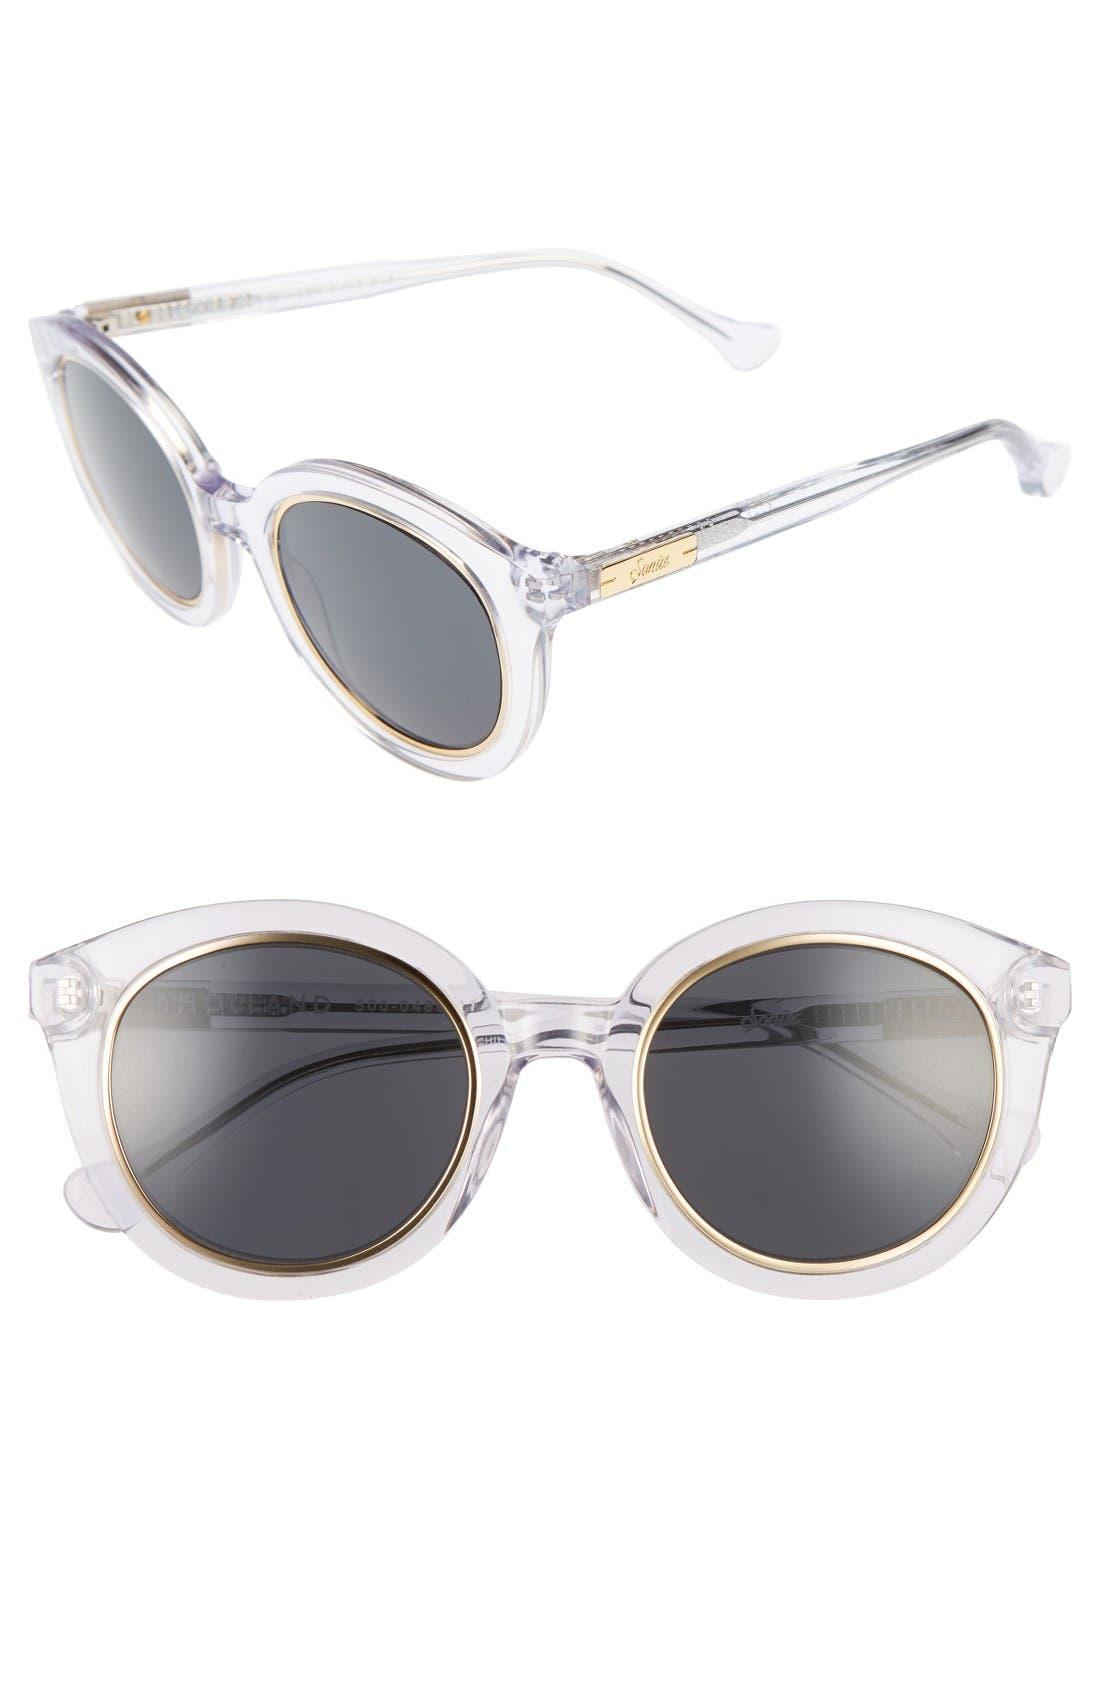 Sonix Holland 50mm Gradient Round Sunglasses